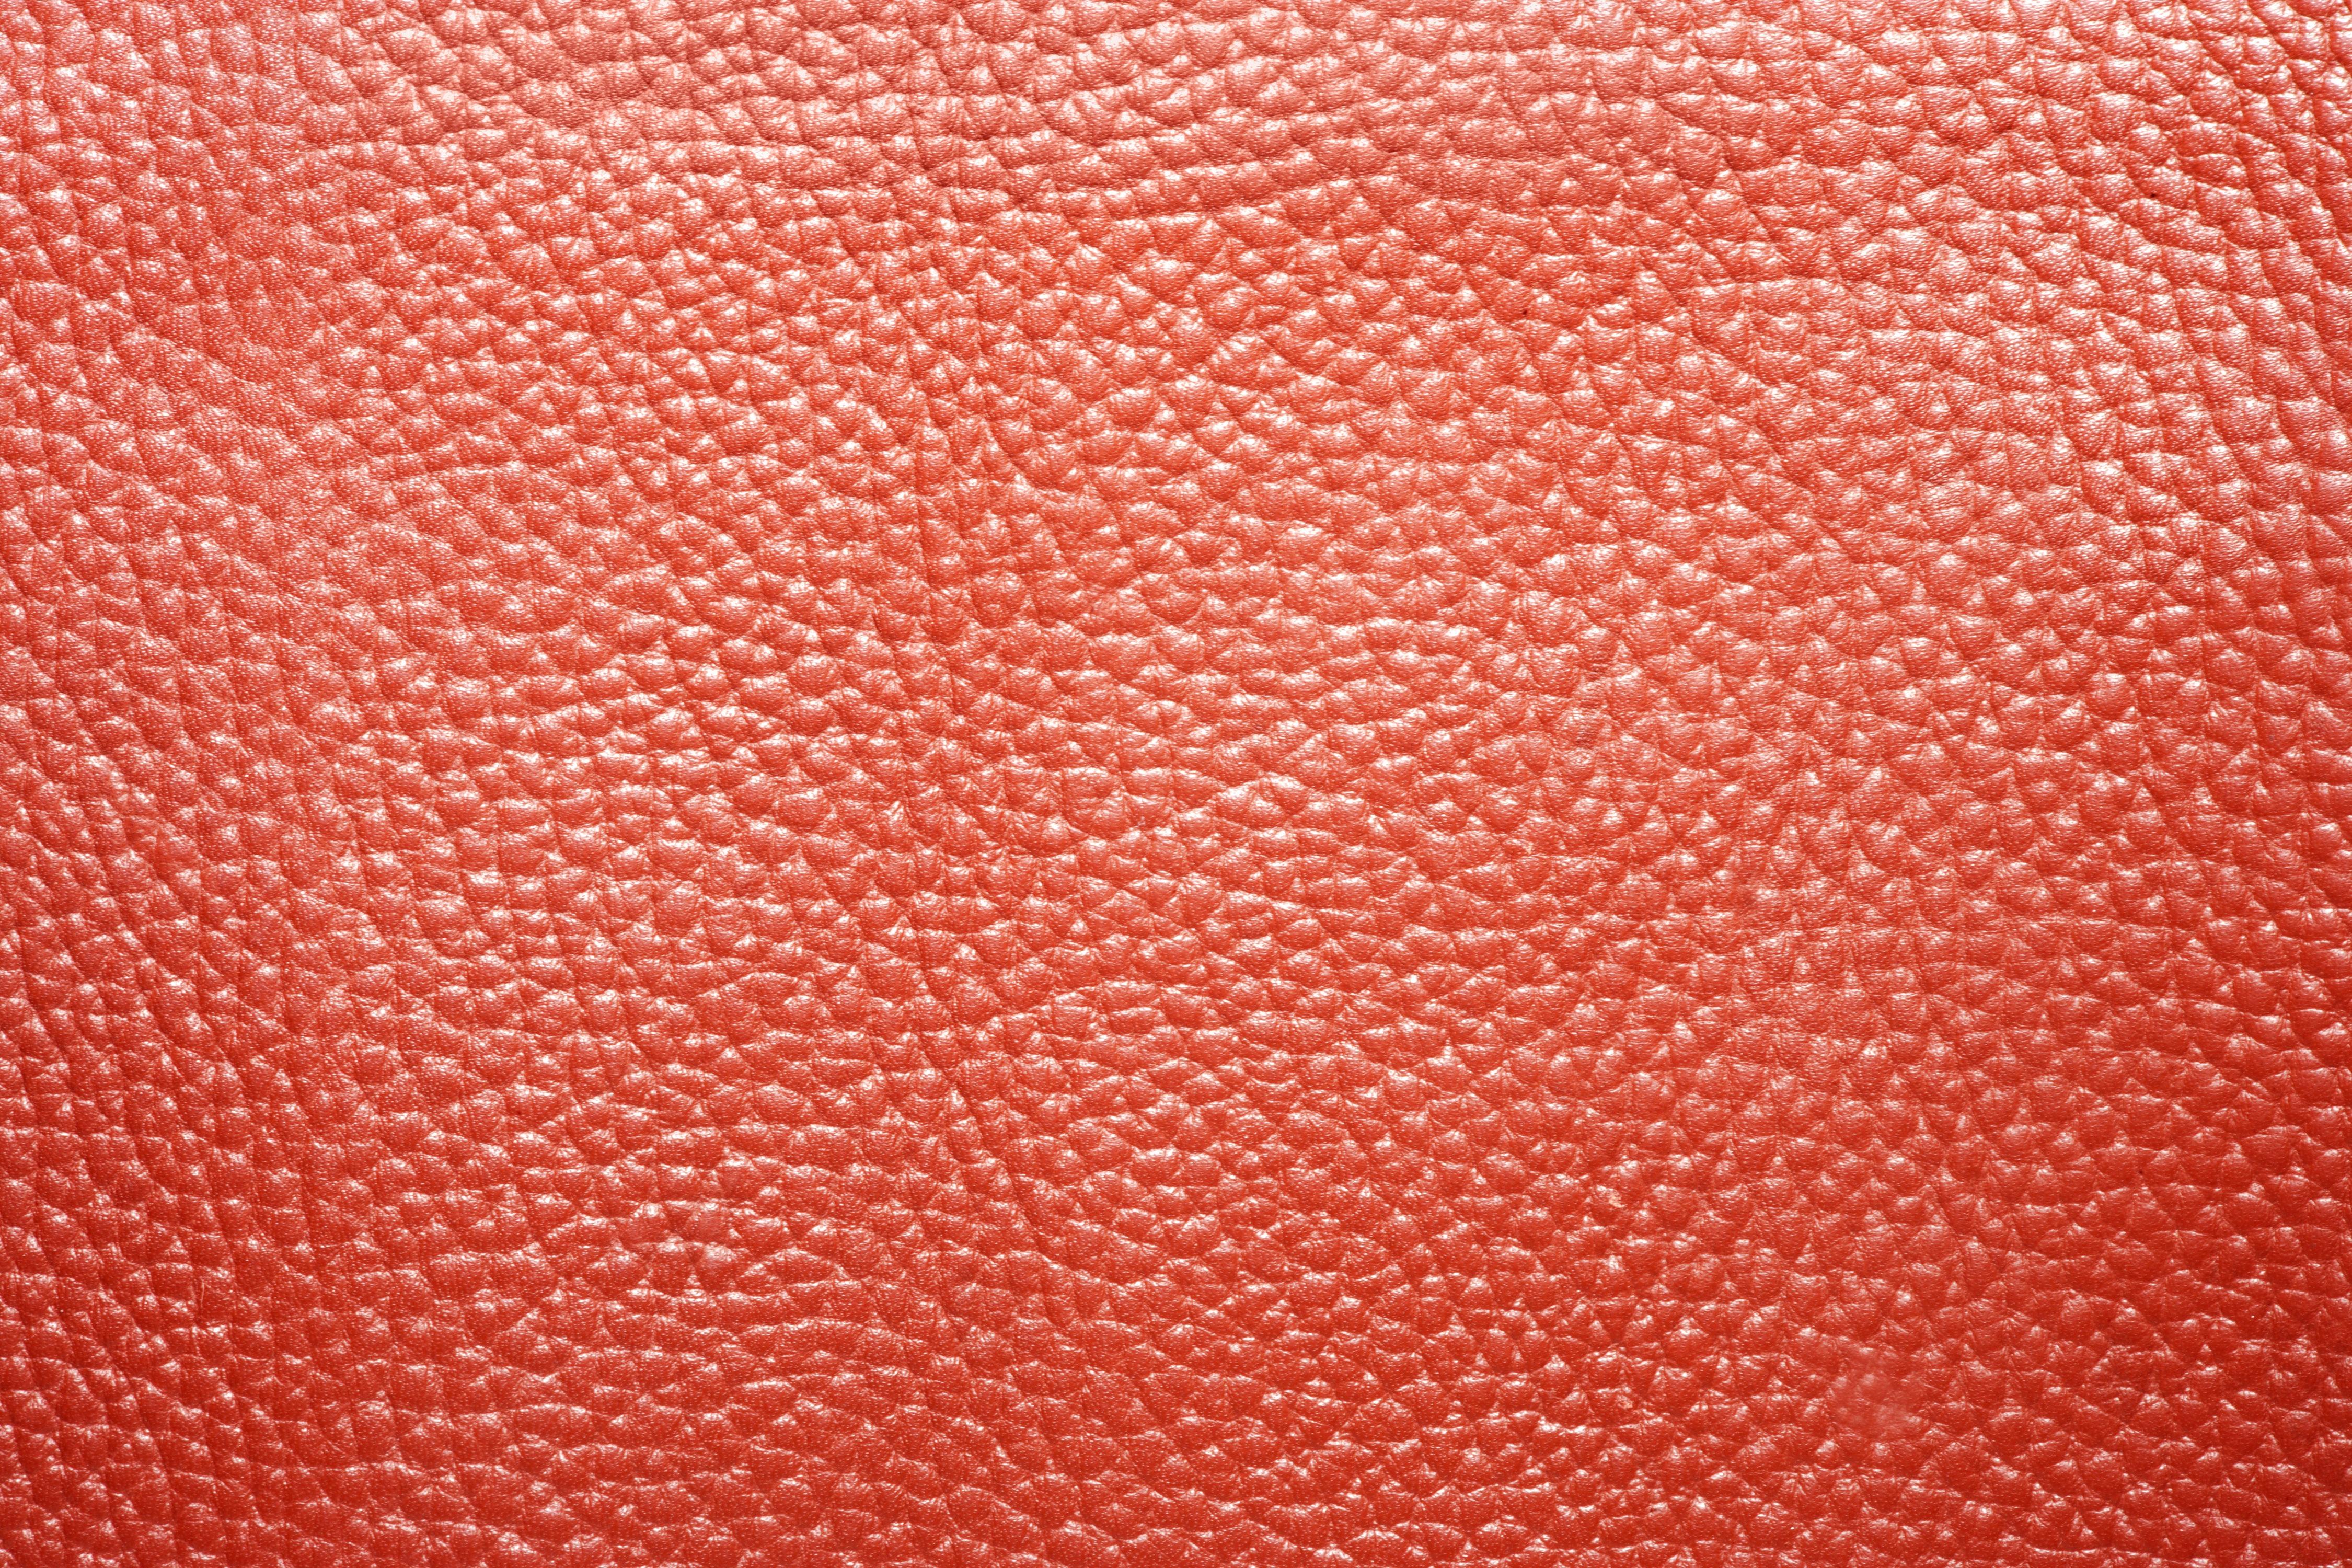 Free Images Leather Vintage Antique Texture Rustic